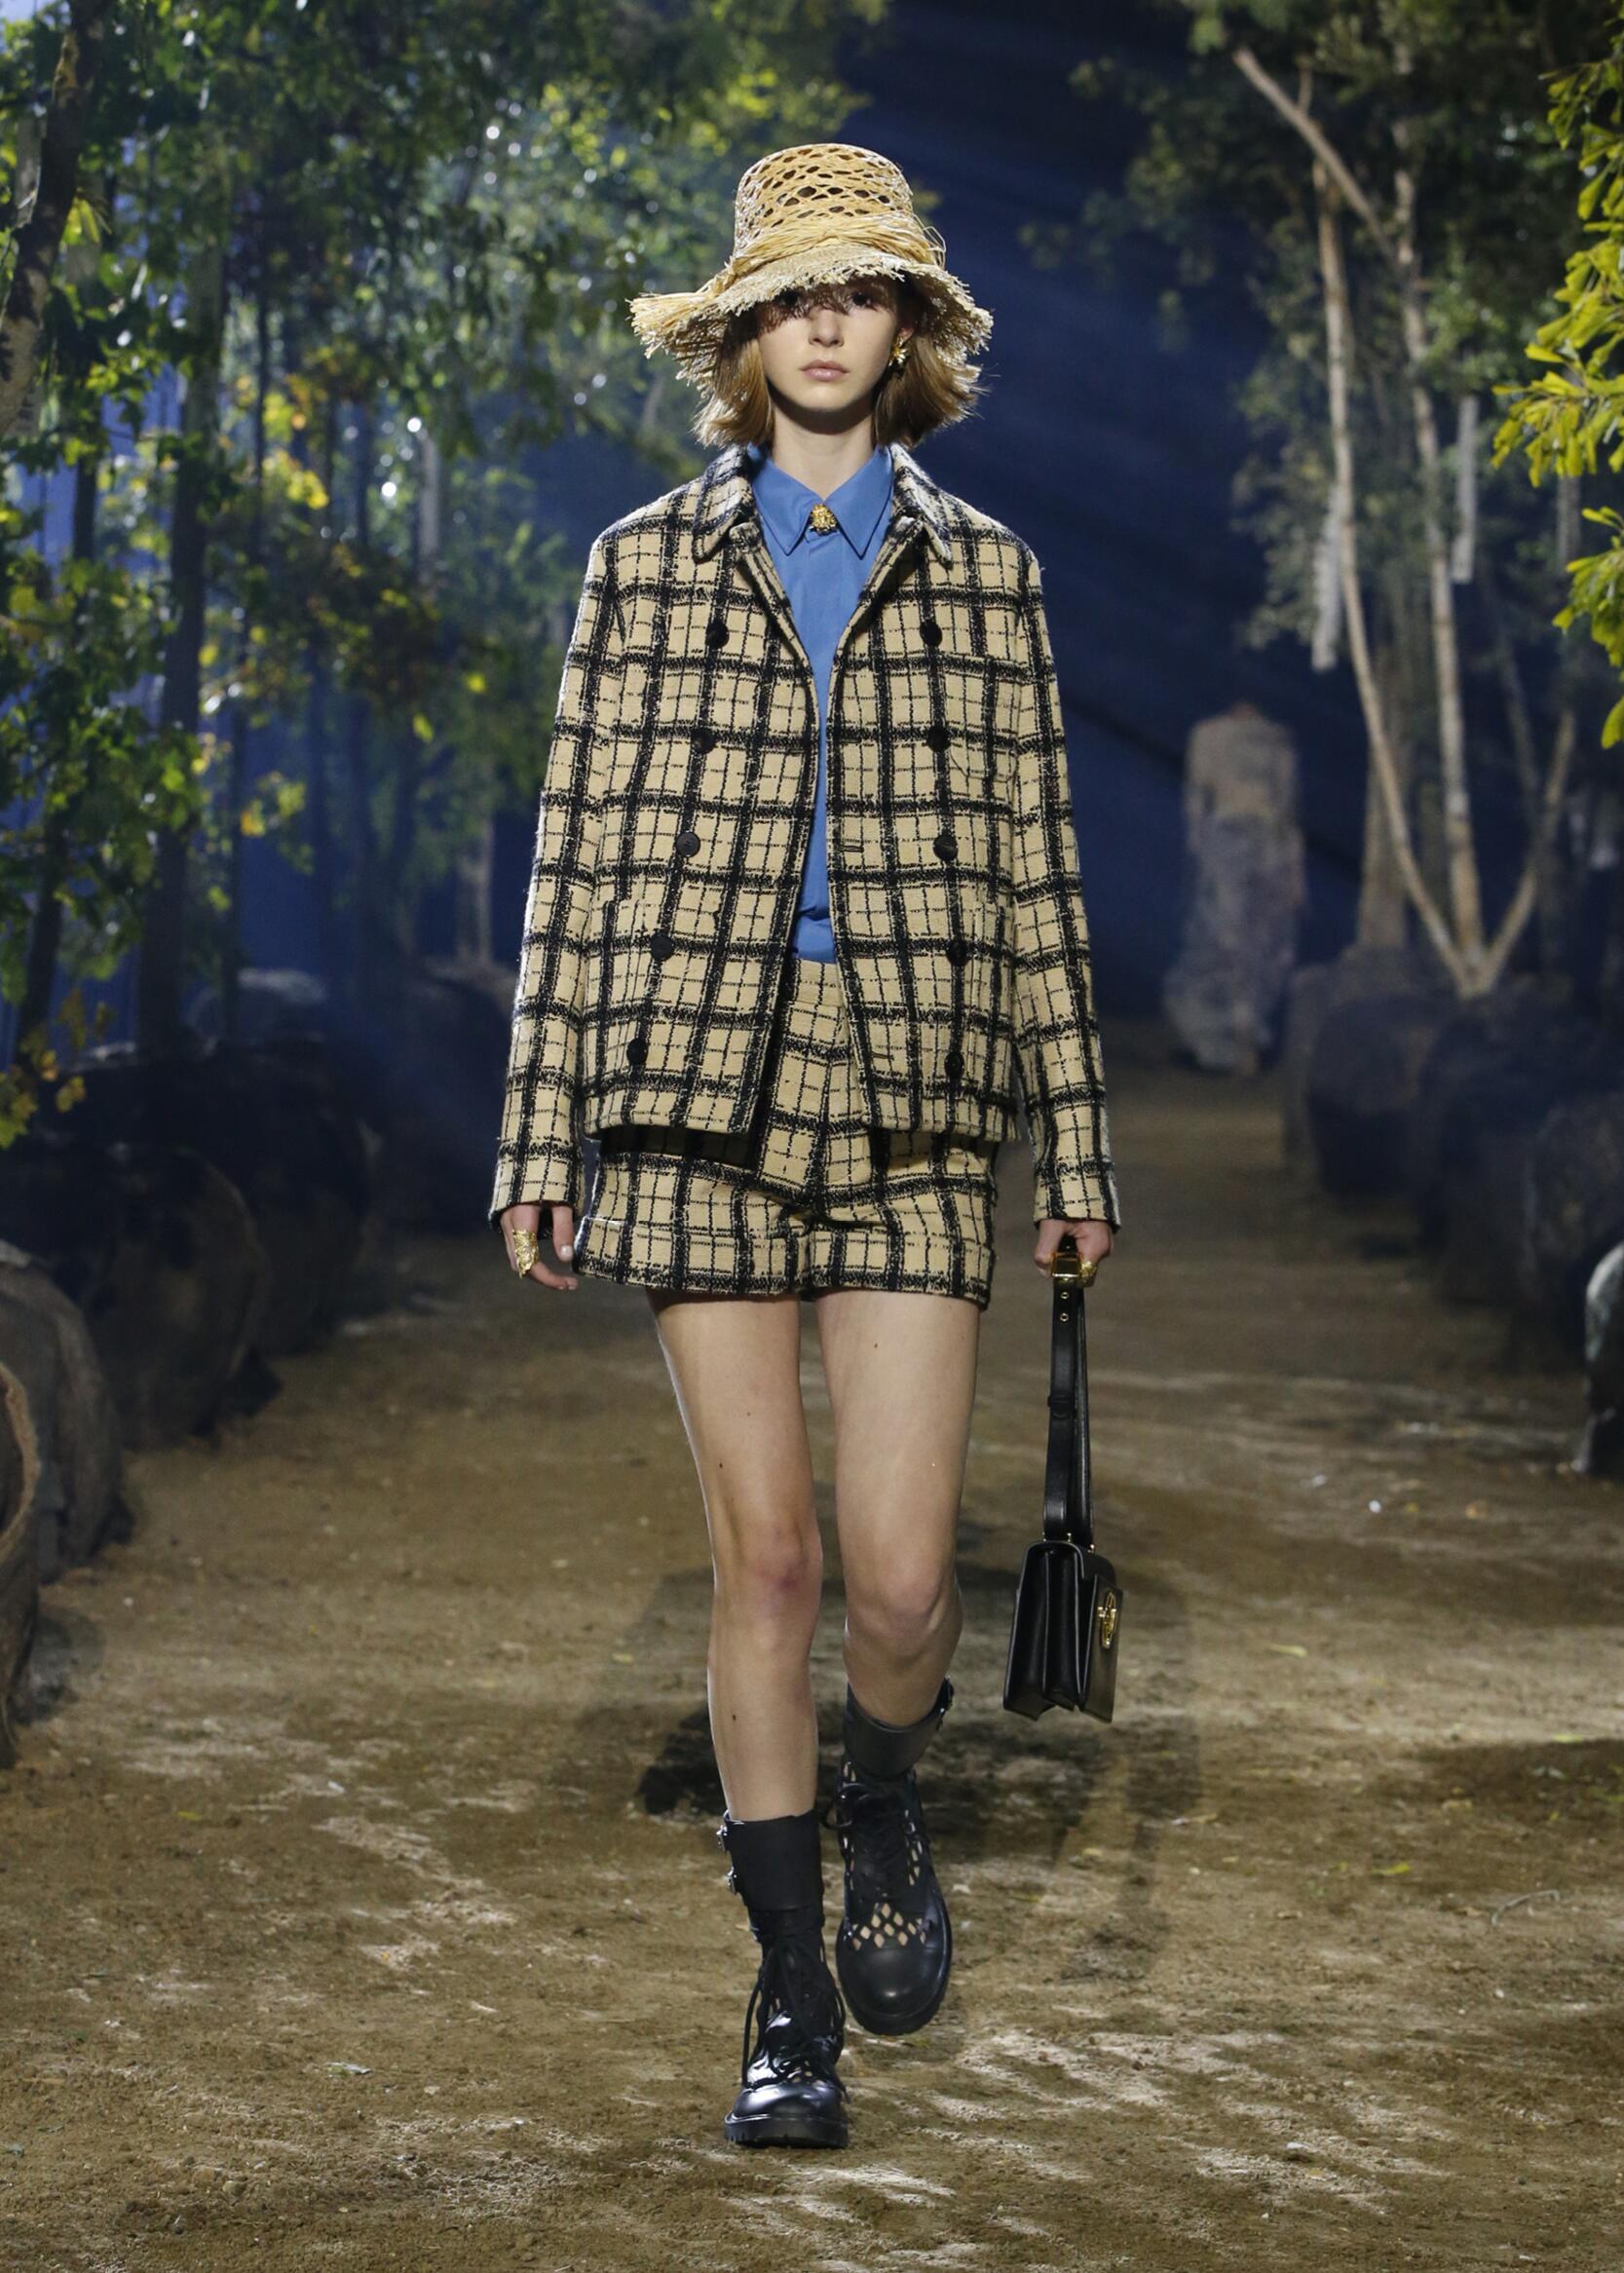 Dior Spring 2020 Catwalk